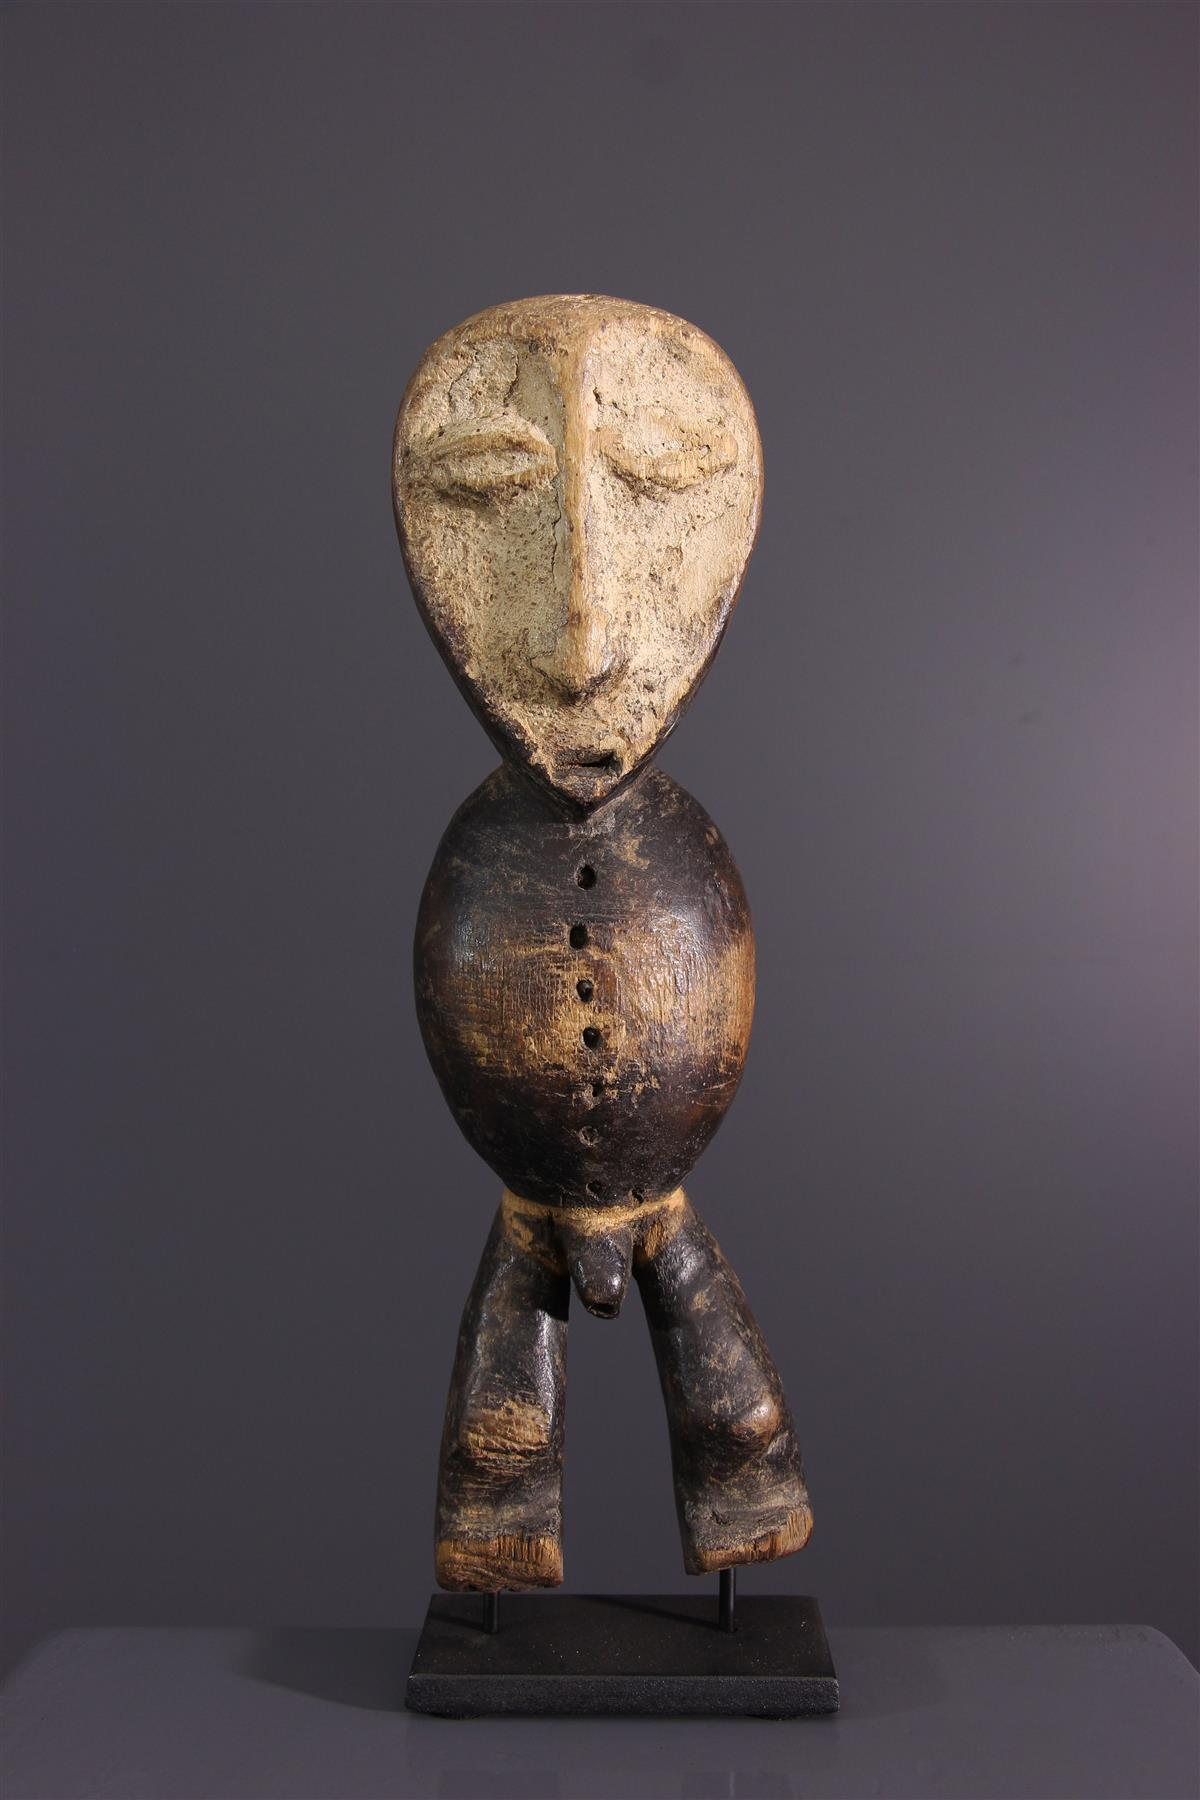 Lega Figurines - African art